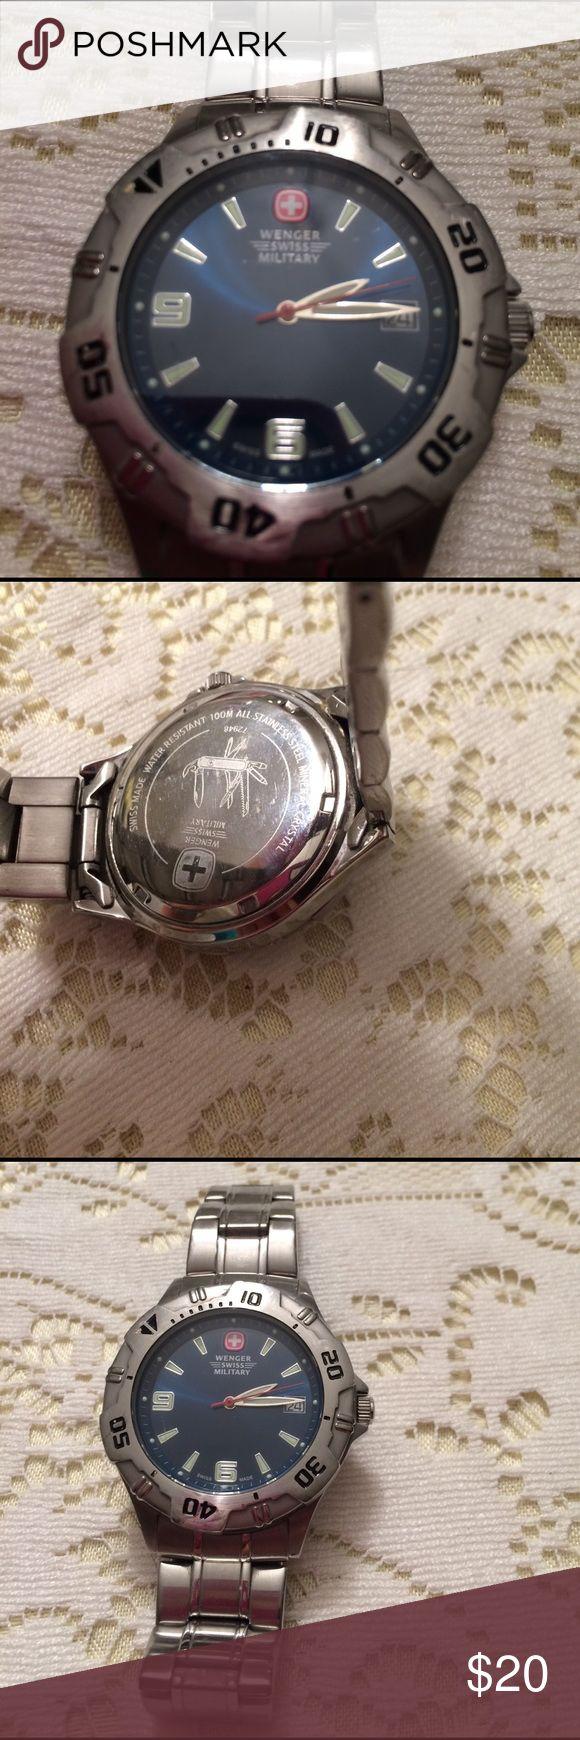 Watch Men's Webber Swiss Military watch. Needs battery. Wenger Swiss Military Accessories Jewelry